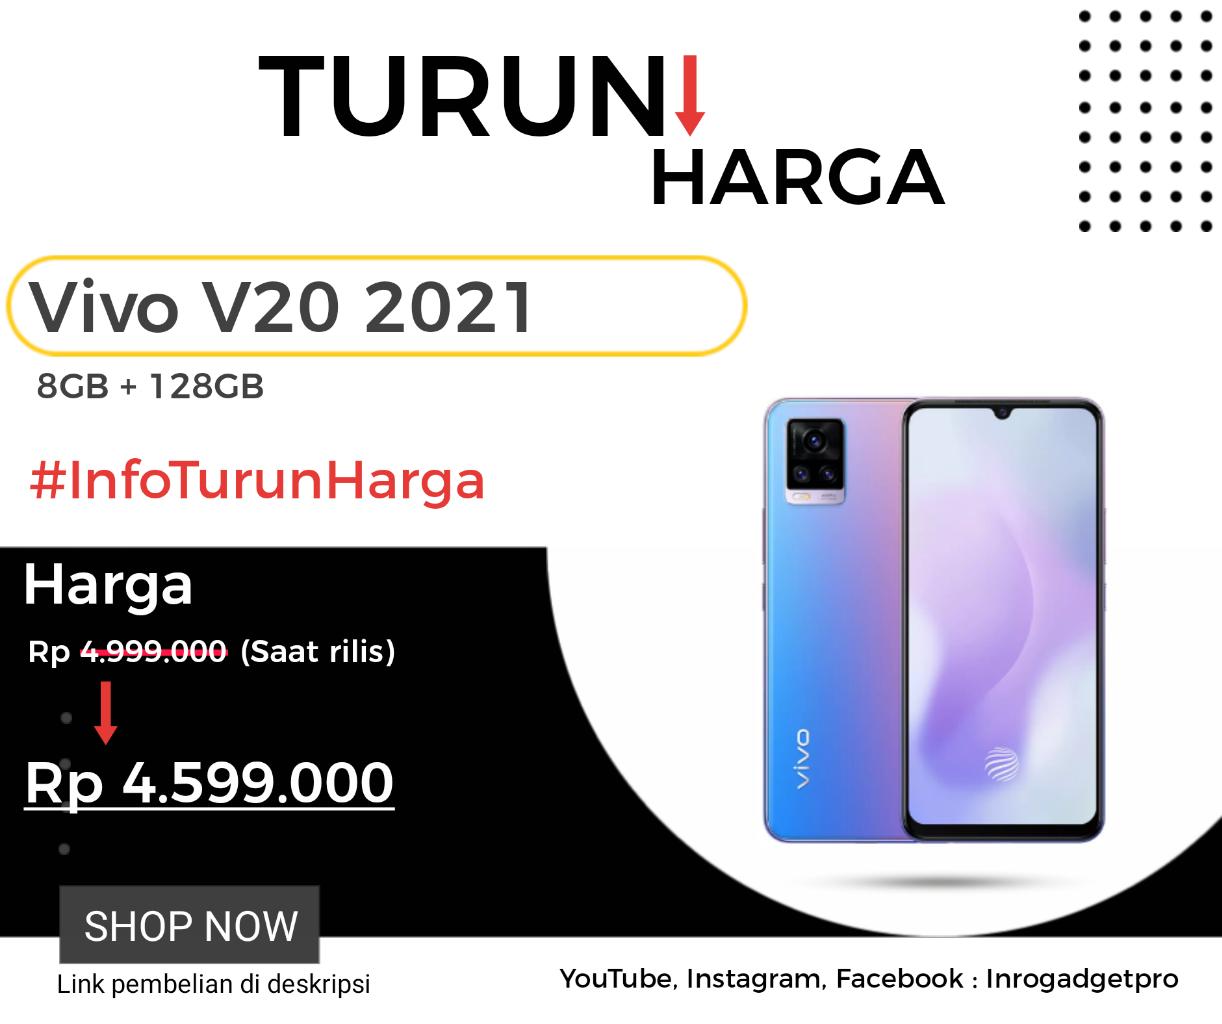 Vivo V20 2021 Turun Harga